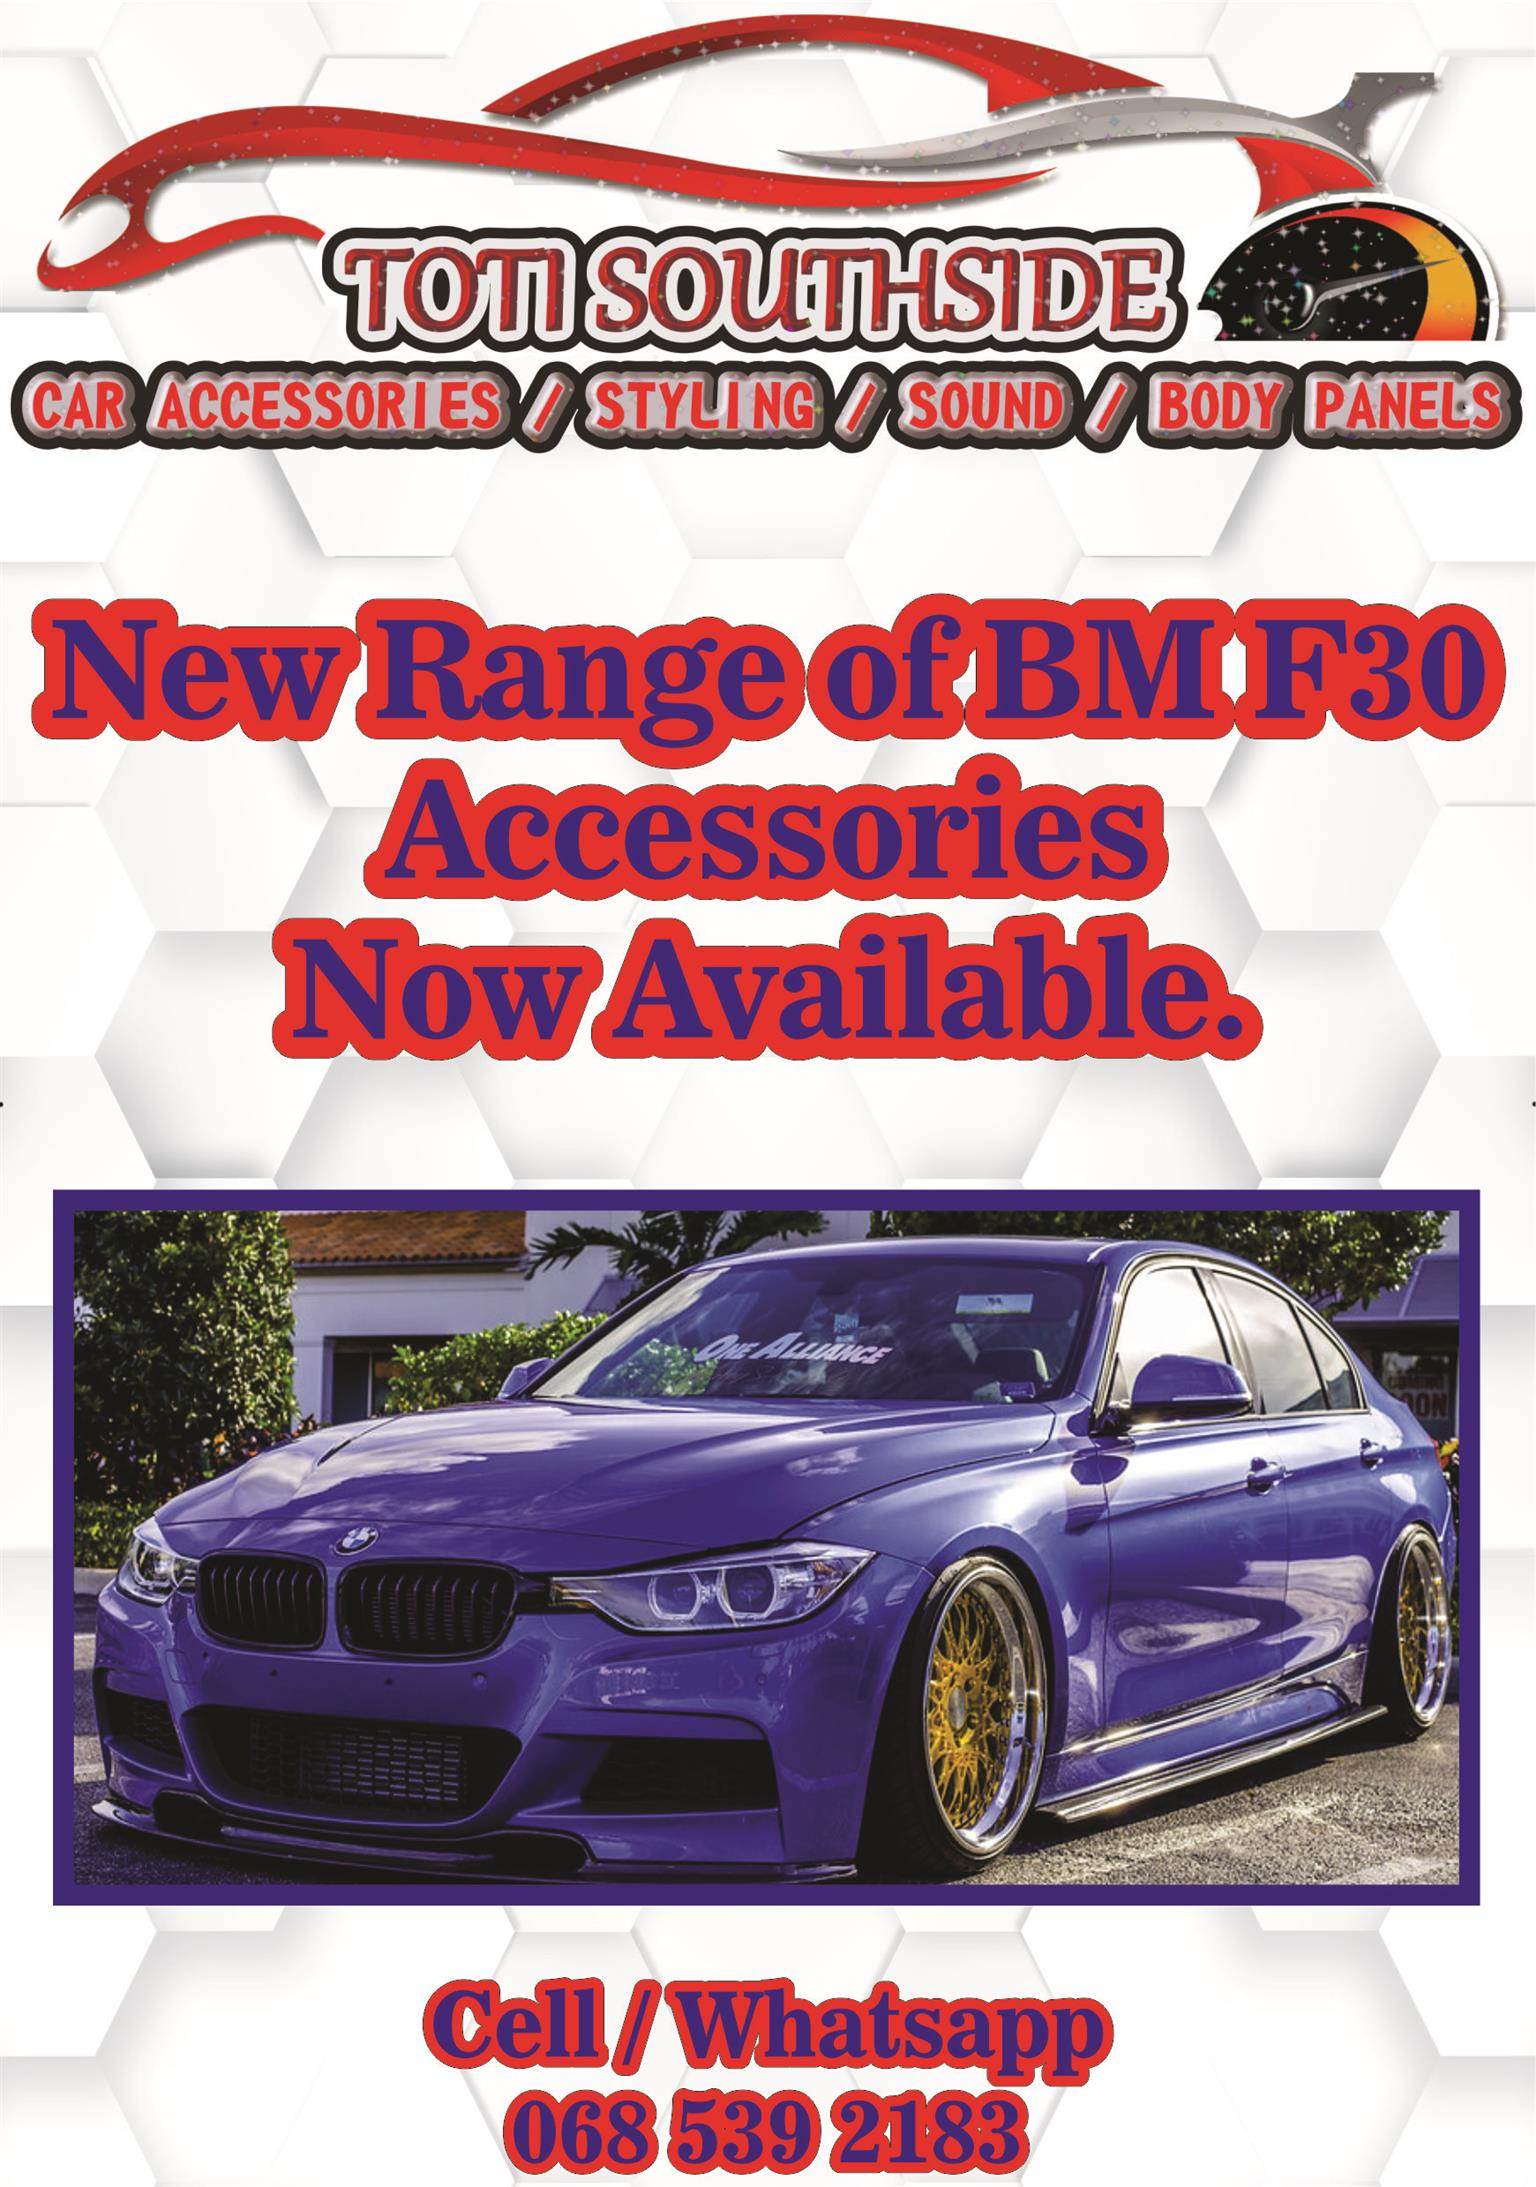 BM F30 Accessories